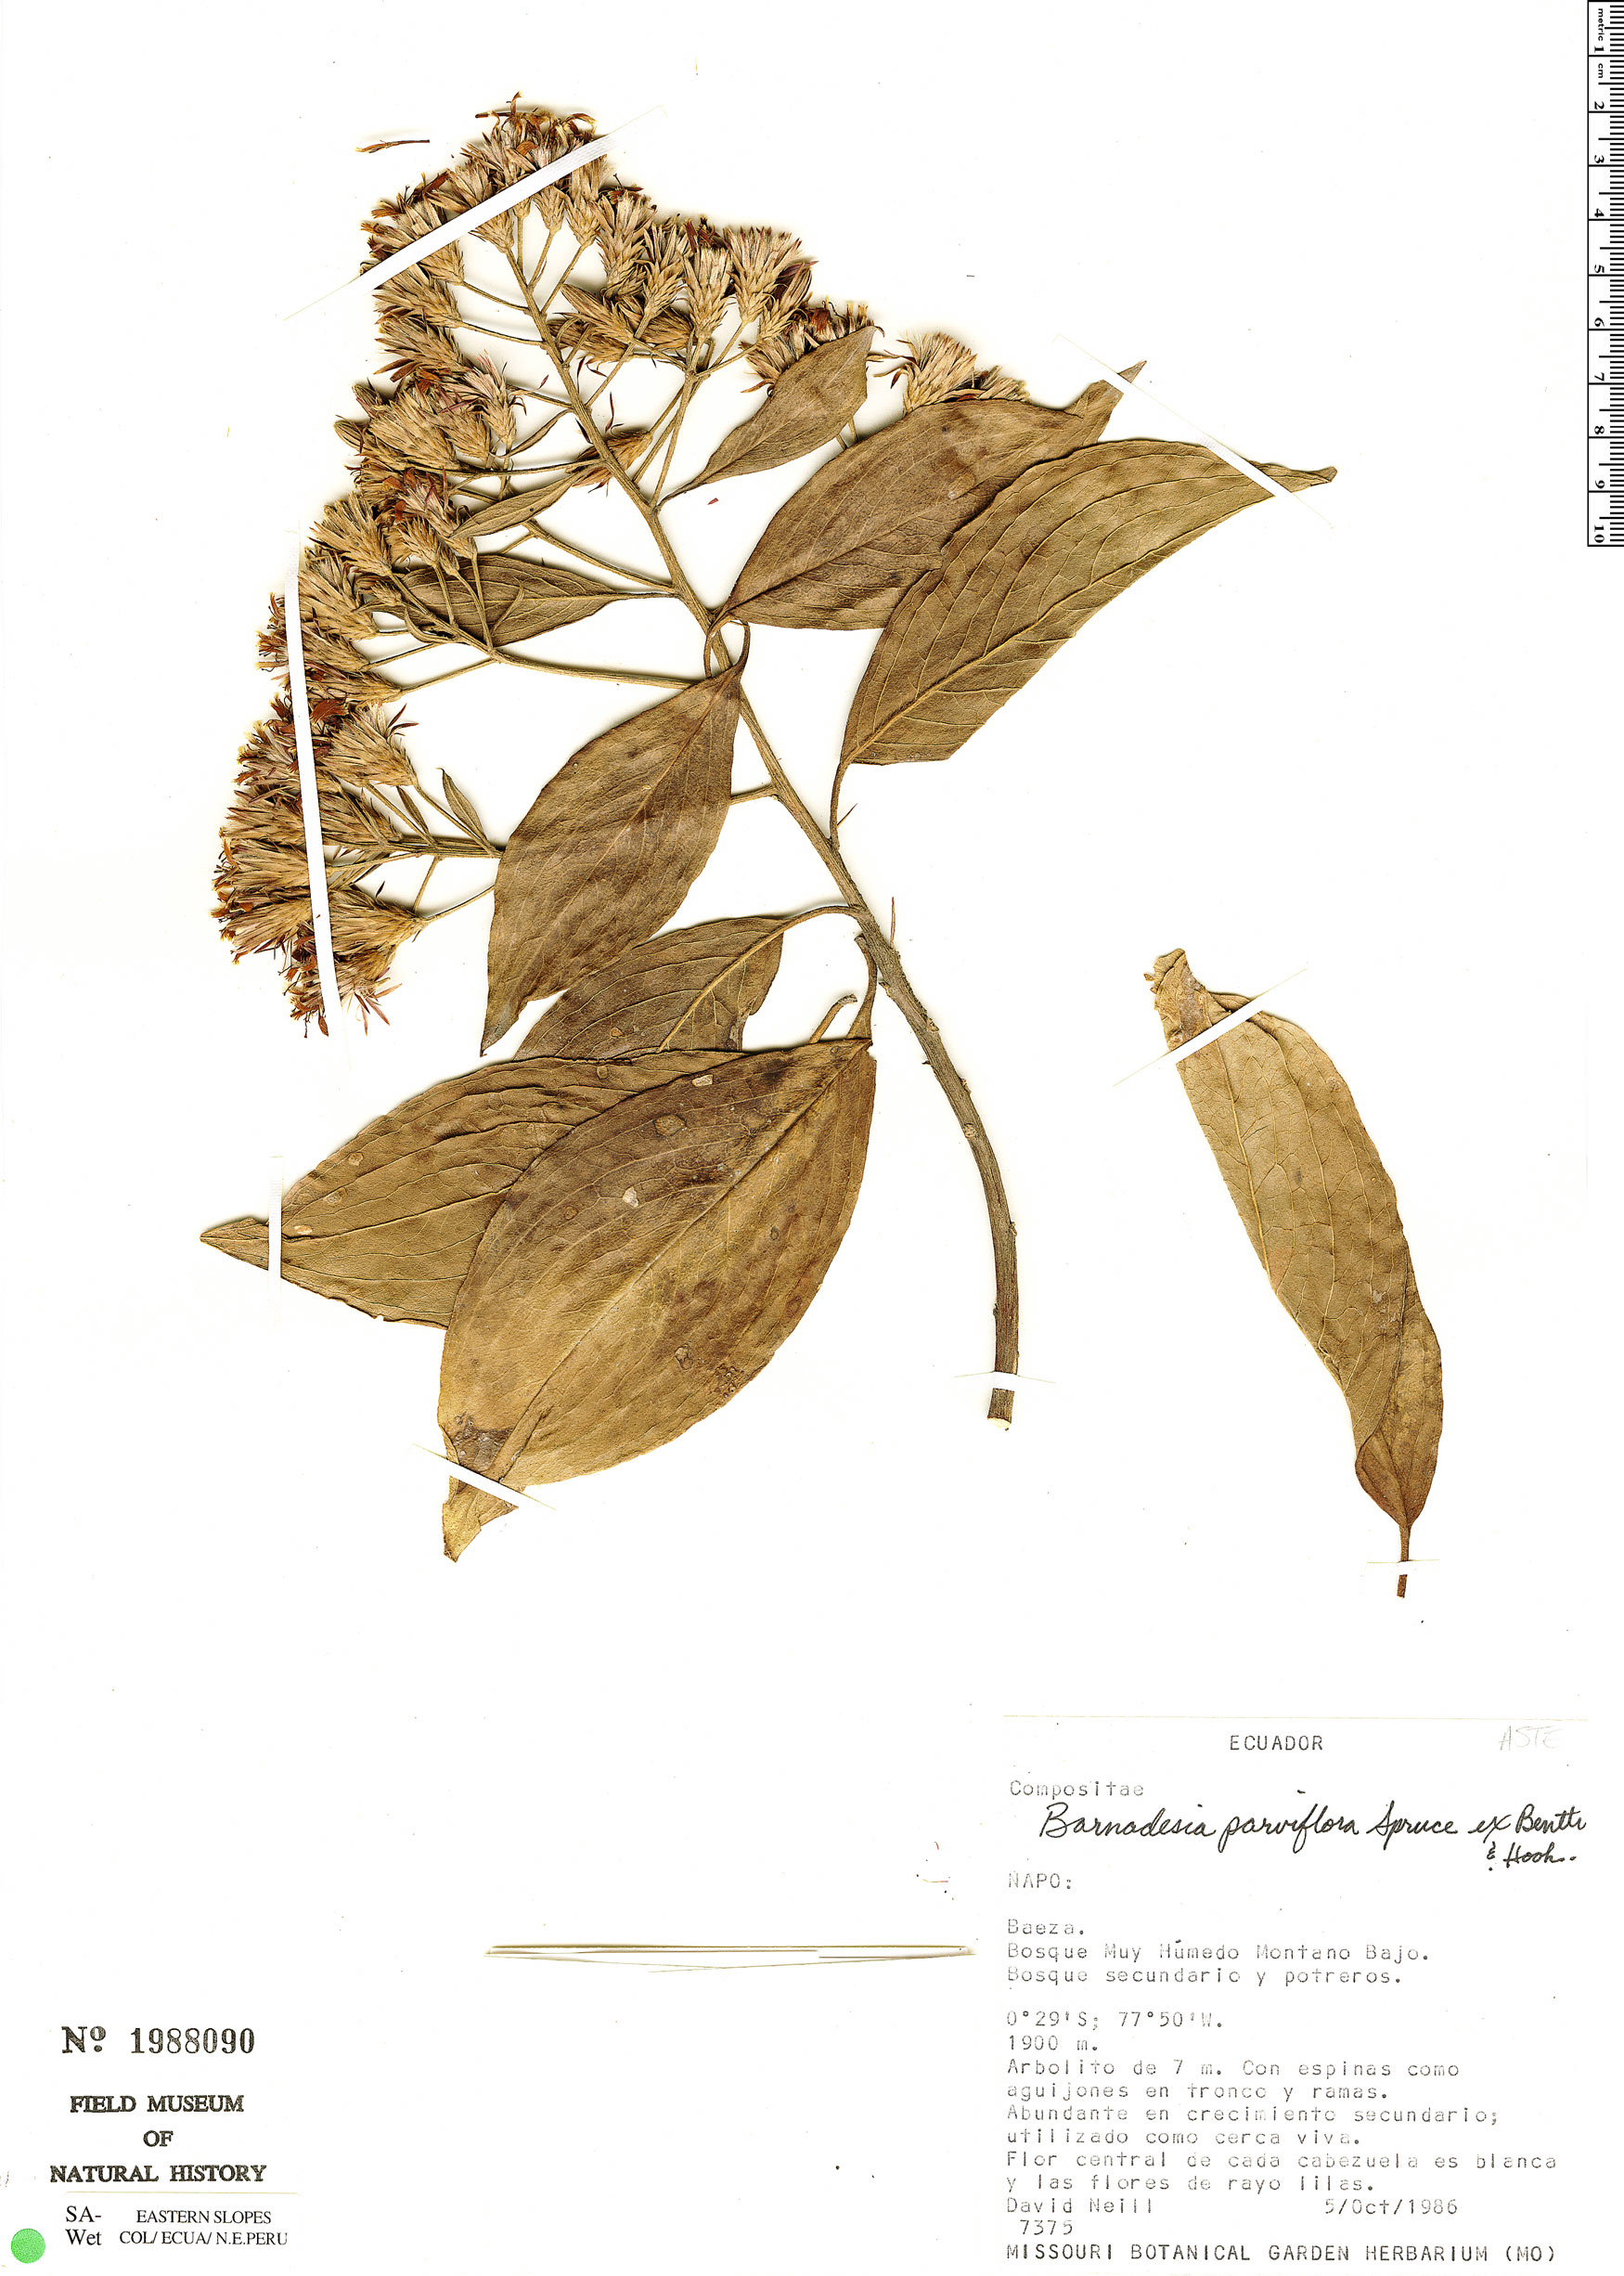 Specimen: Barnadesia parviflora